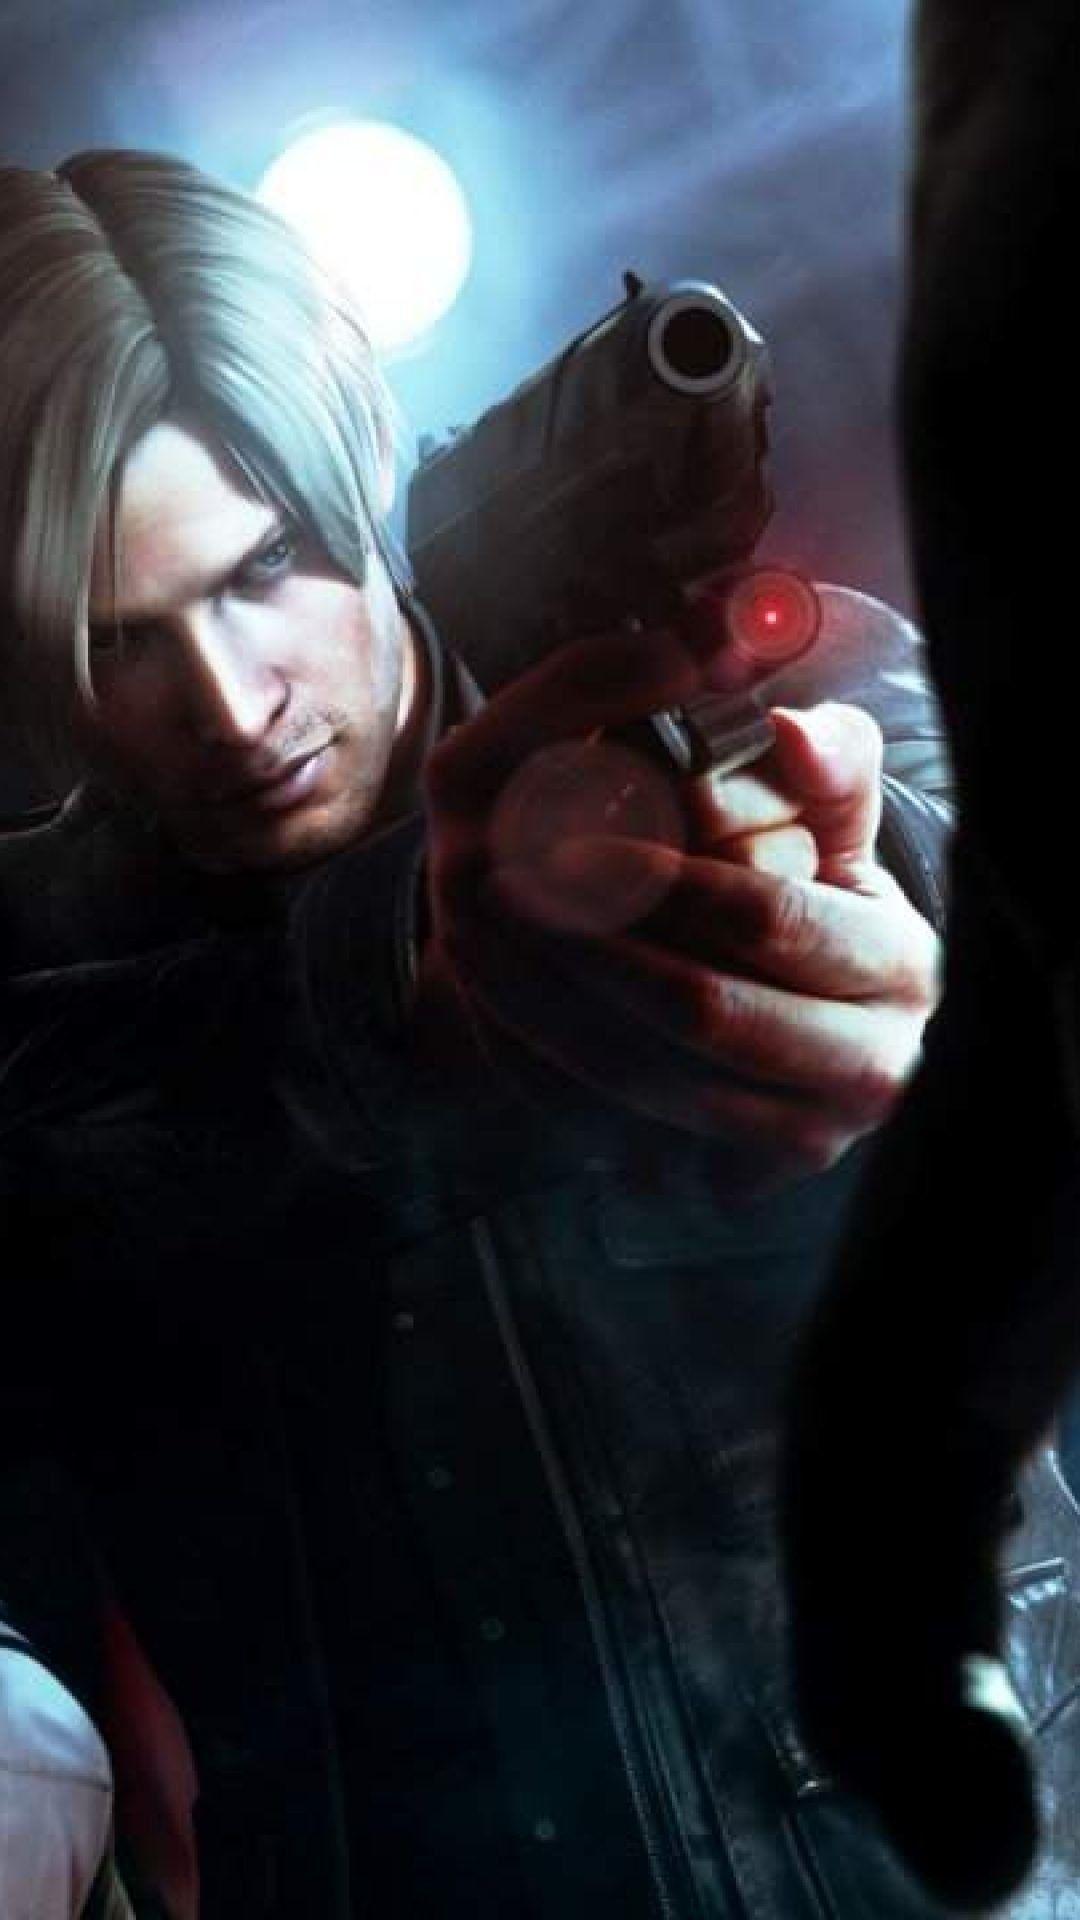 1080x1920 Resident Evil 6 Wallpaper Hd 1080p